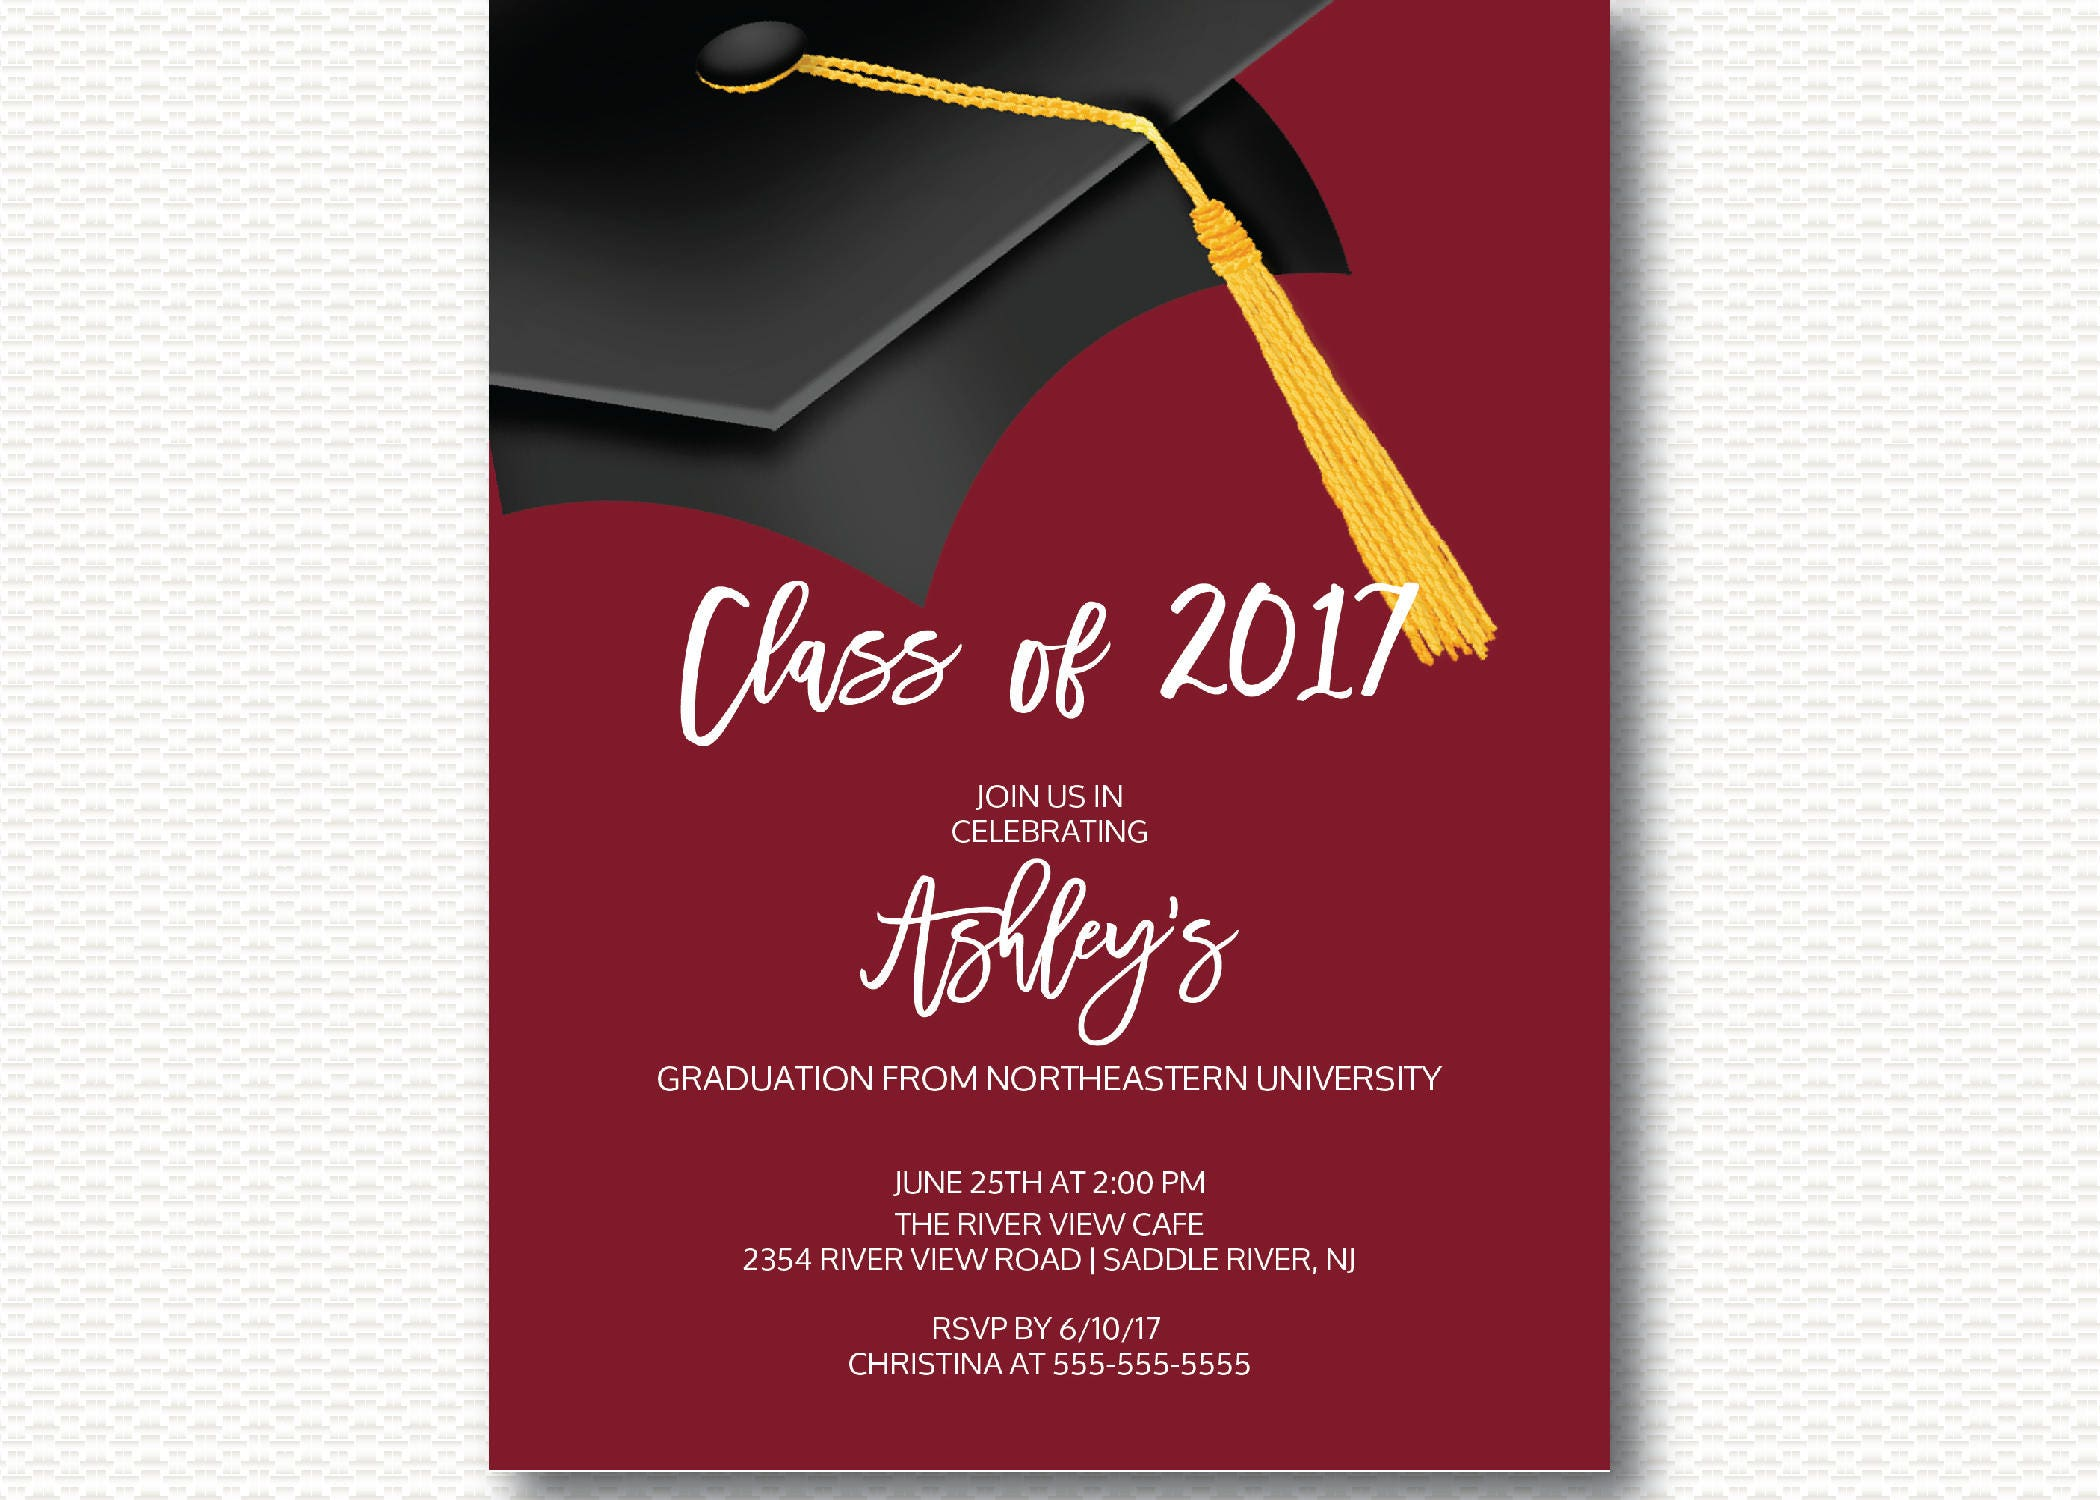 Graduation Invitation Class of 2017 Graduation Cap Hat